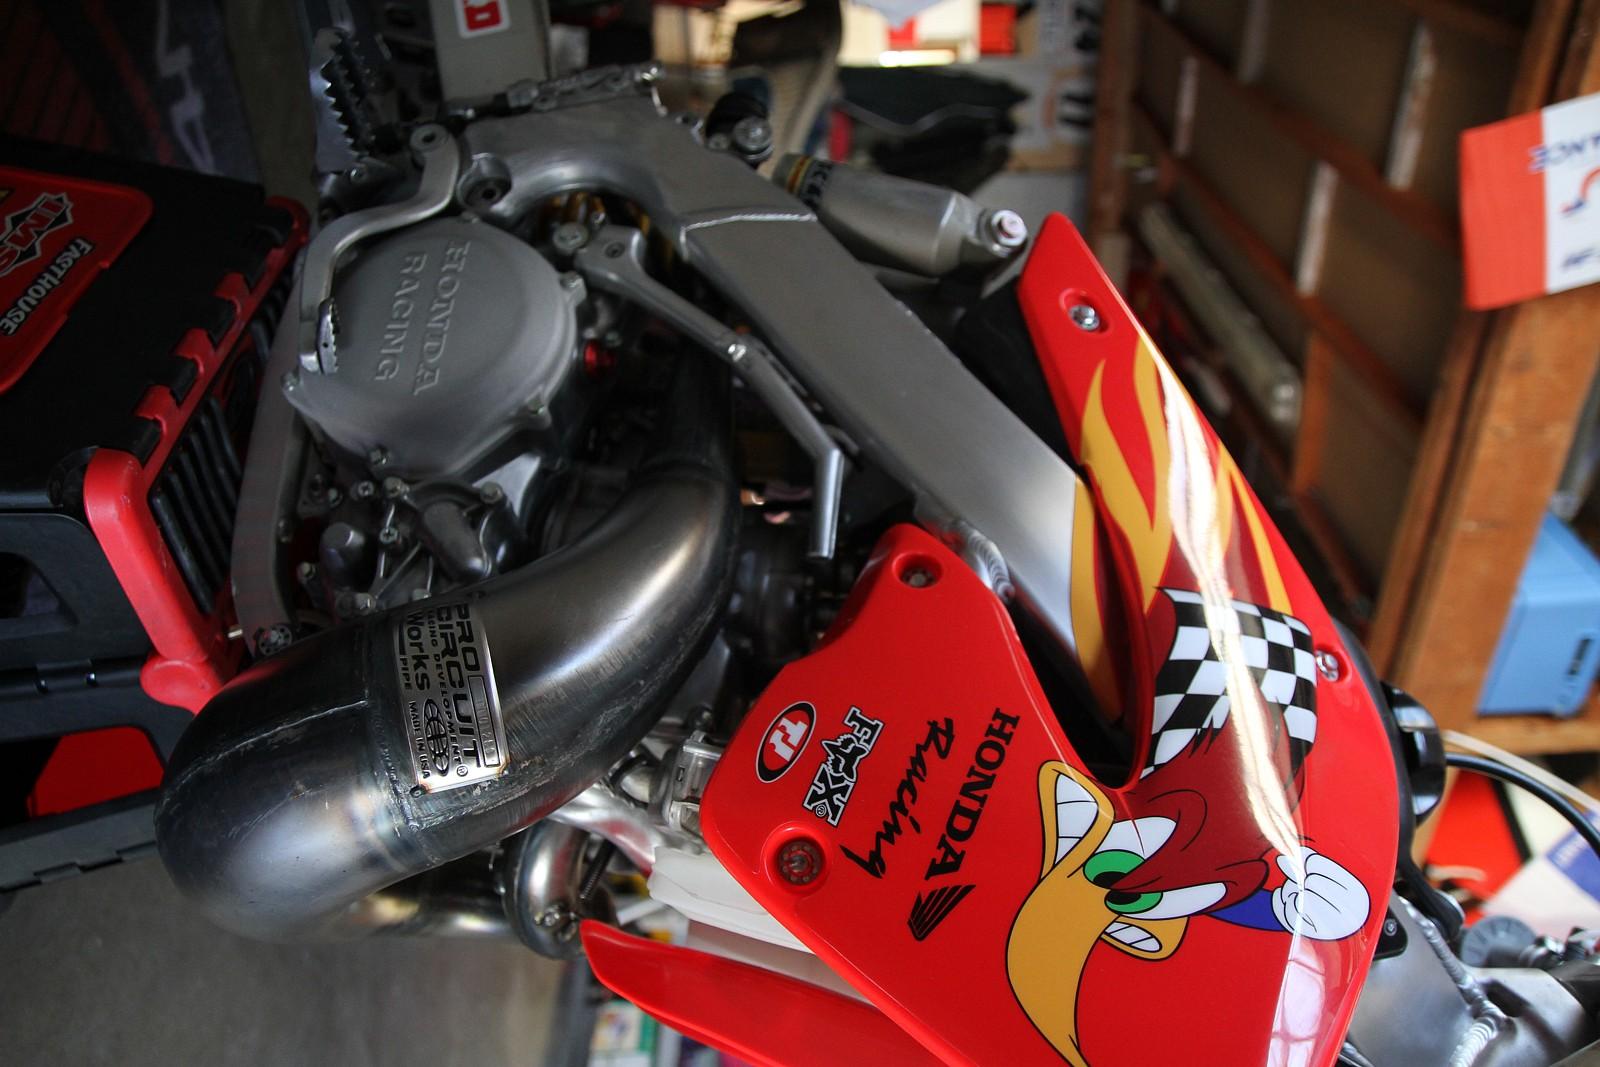 6F0000FA-3E39-4ED3-B070-326CB62A1BCD - Godcho - Motocross Pictures - Vital MX